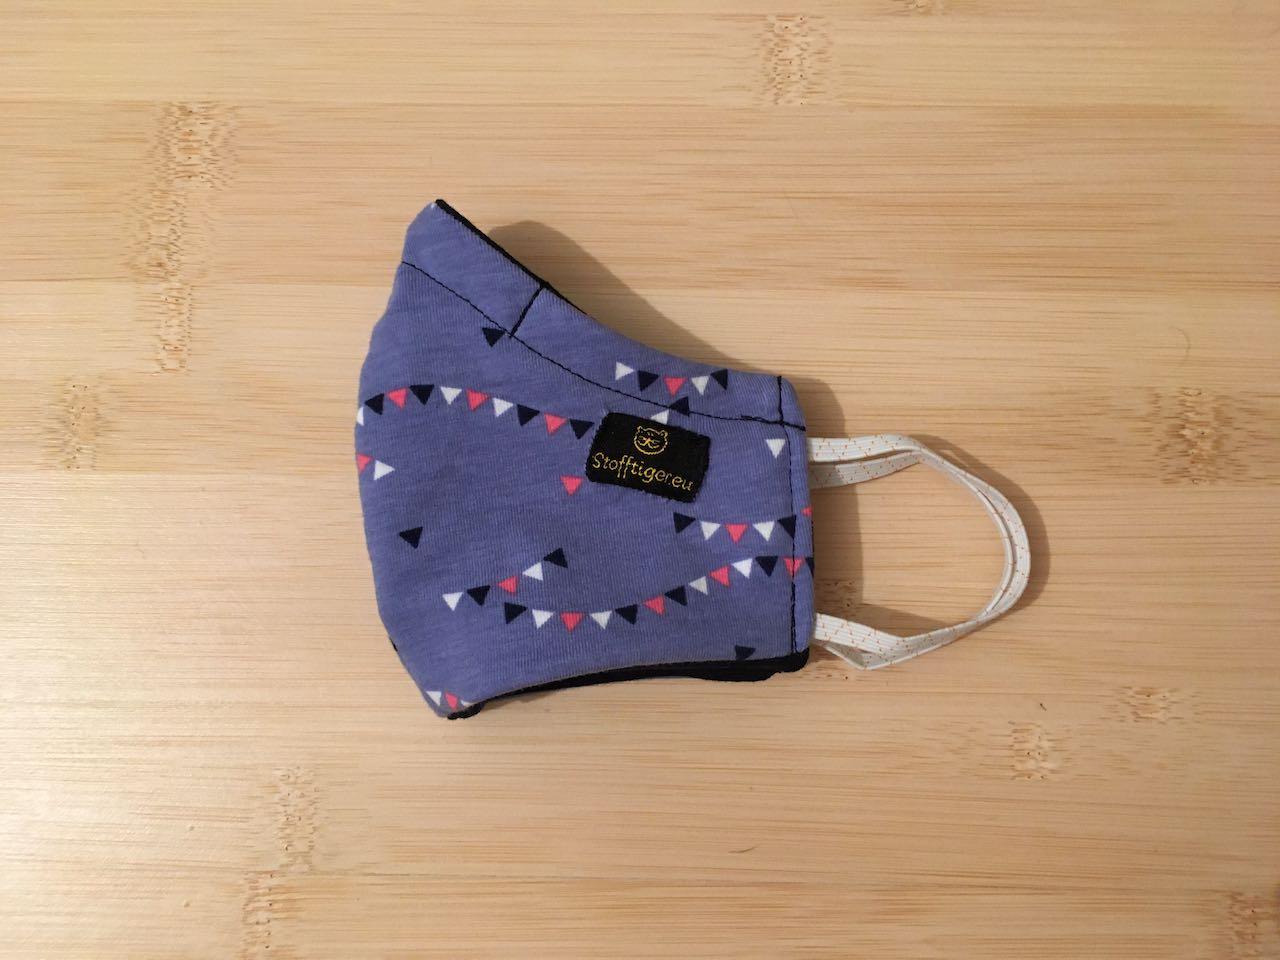 Kinder Mund- & Nasenmaske Wipperl violett / dunkel blau